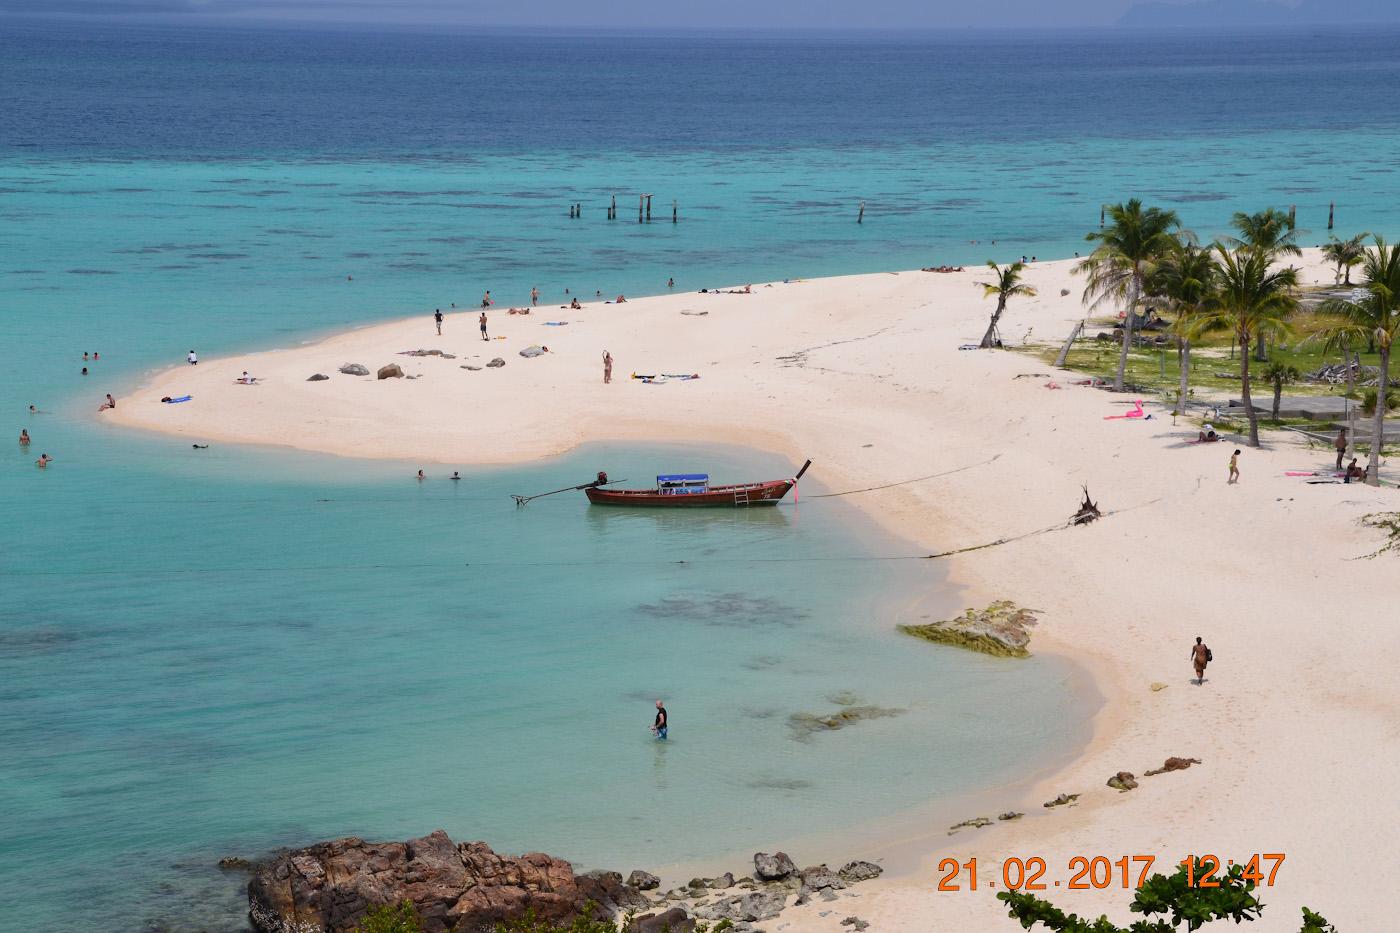 Фото 12. Коса, отделяющая пляжи Sunrise Beach и Bulow beach на острове Ко Ланта. Как отдохнуть в Таиланде дикарём.